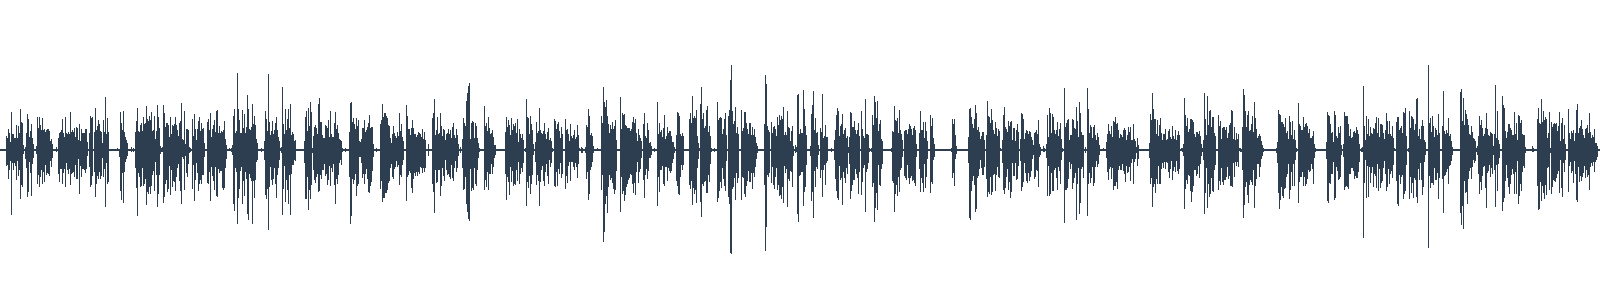 Denis McBride: Putovanie s Jonášom (1) waveform